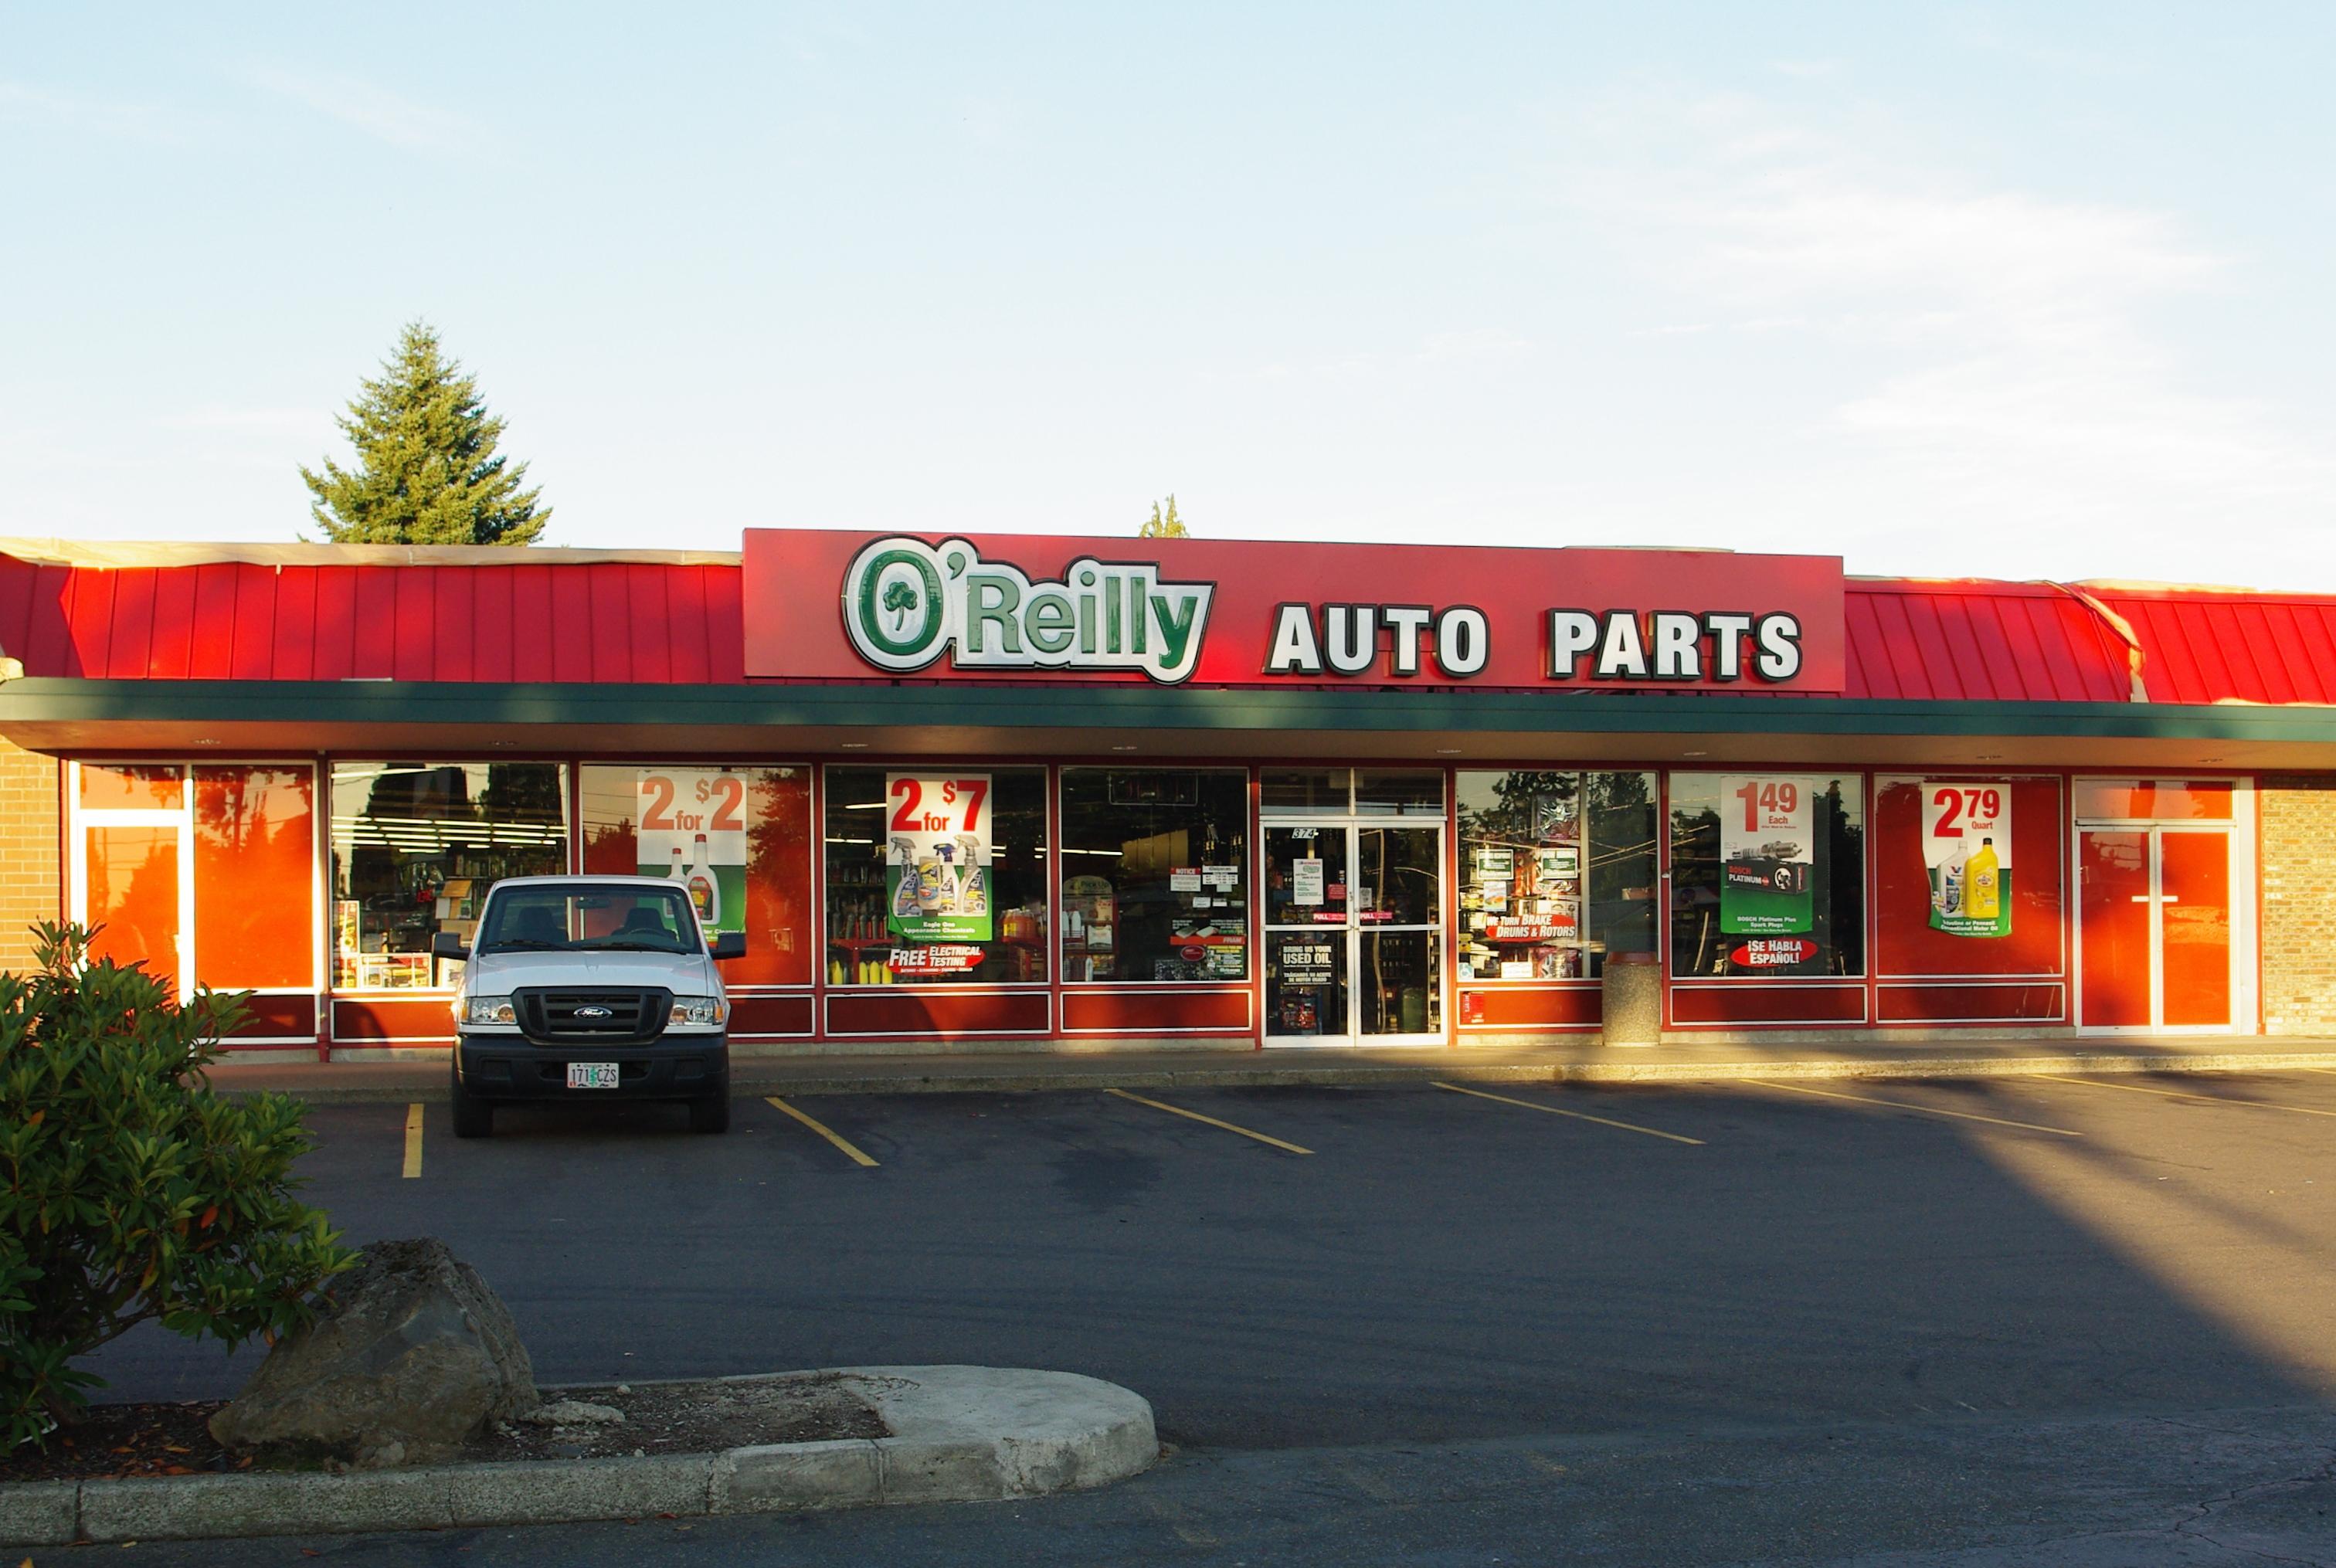 o'reilly auto parts - photo #14